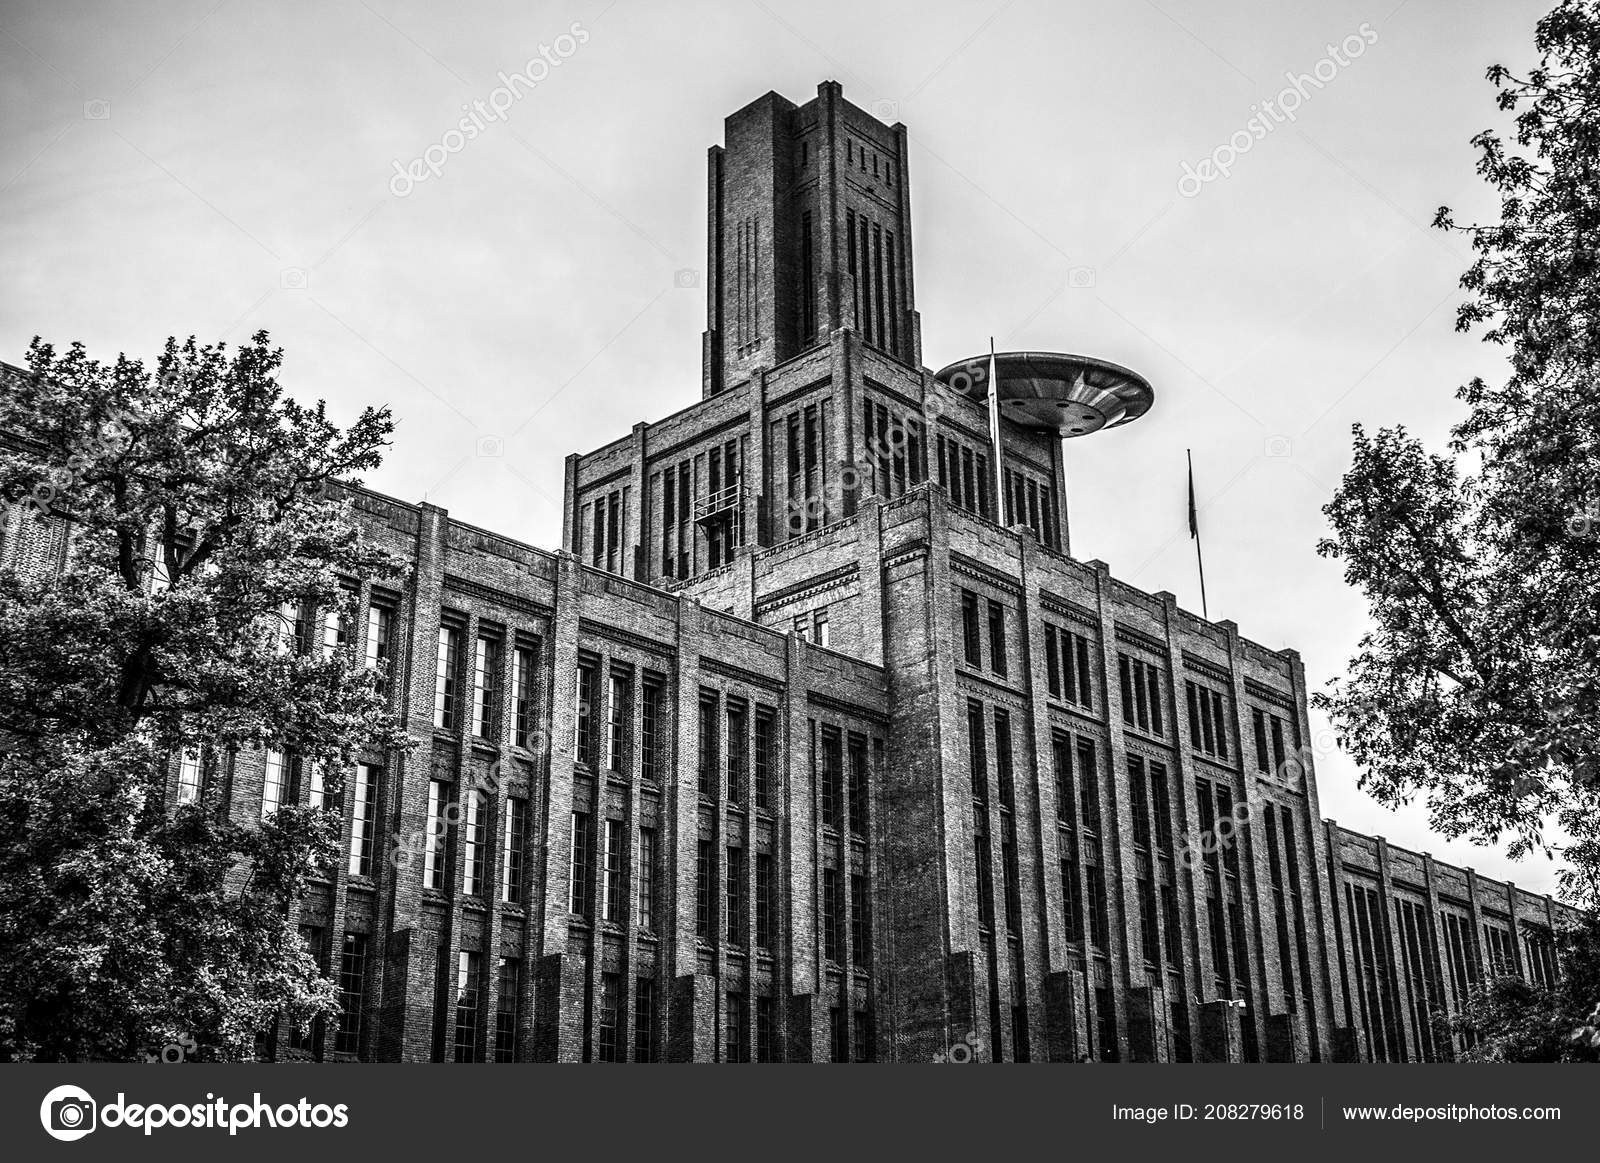 Netherlands utrecht may 2017 modern city architecture black white photo stock photo